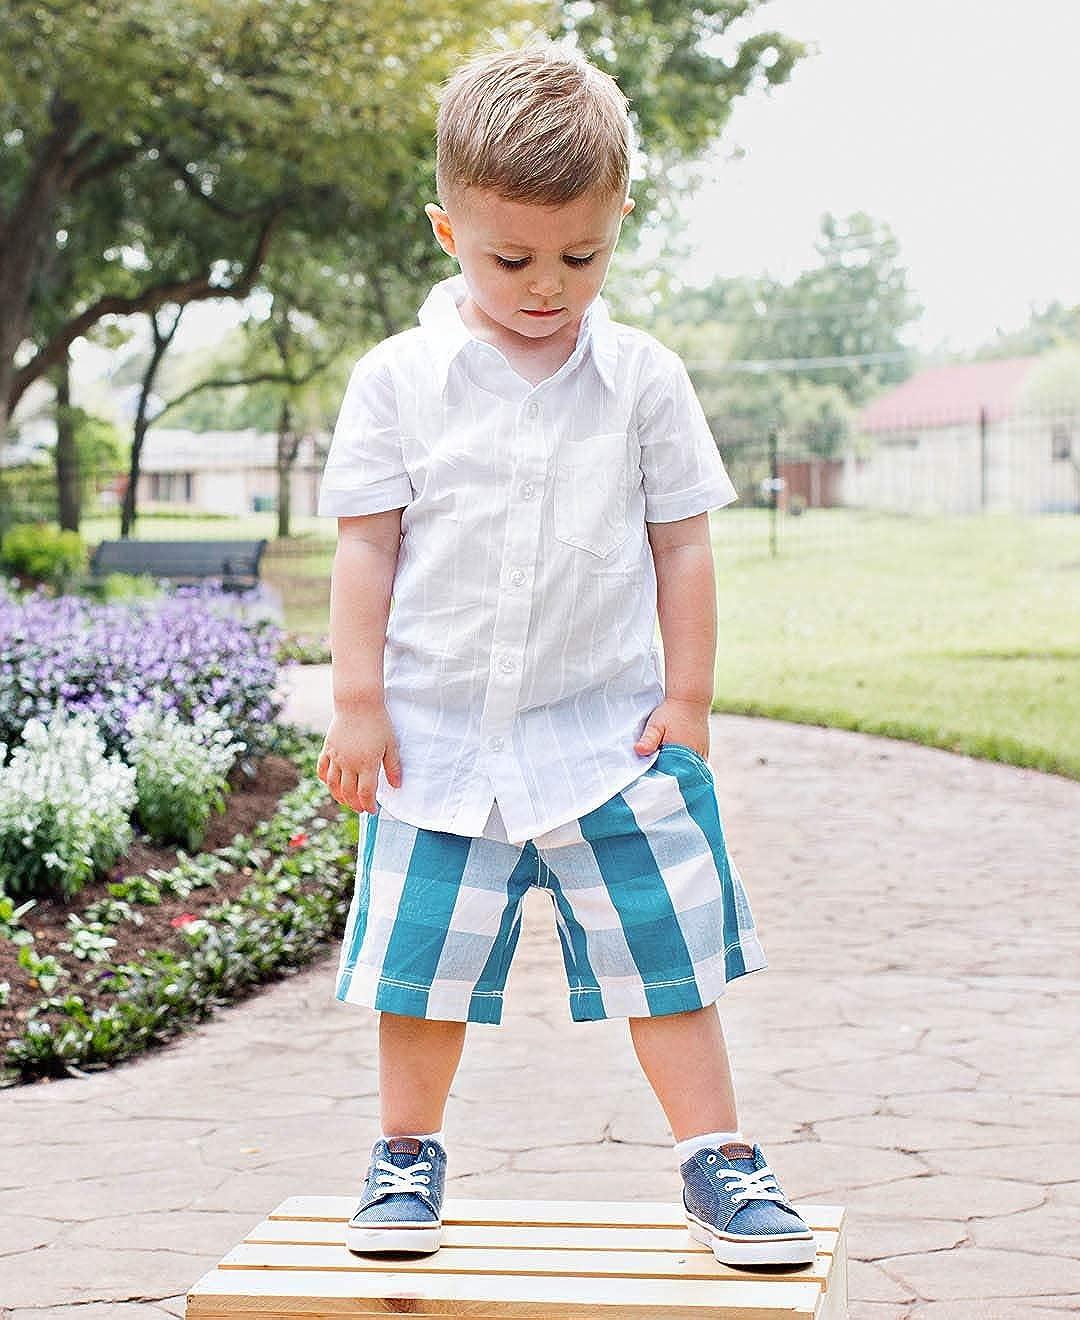 RuggedButts Baby//Toddler Boys Adjustable Waist Plaid Shorts BTWYYXX-PLAD-SC-BABY